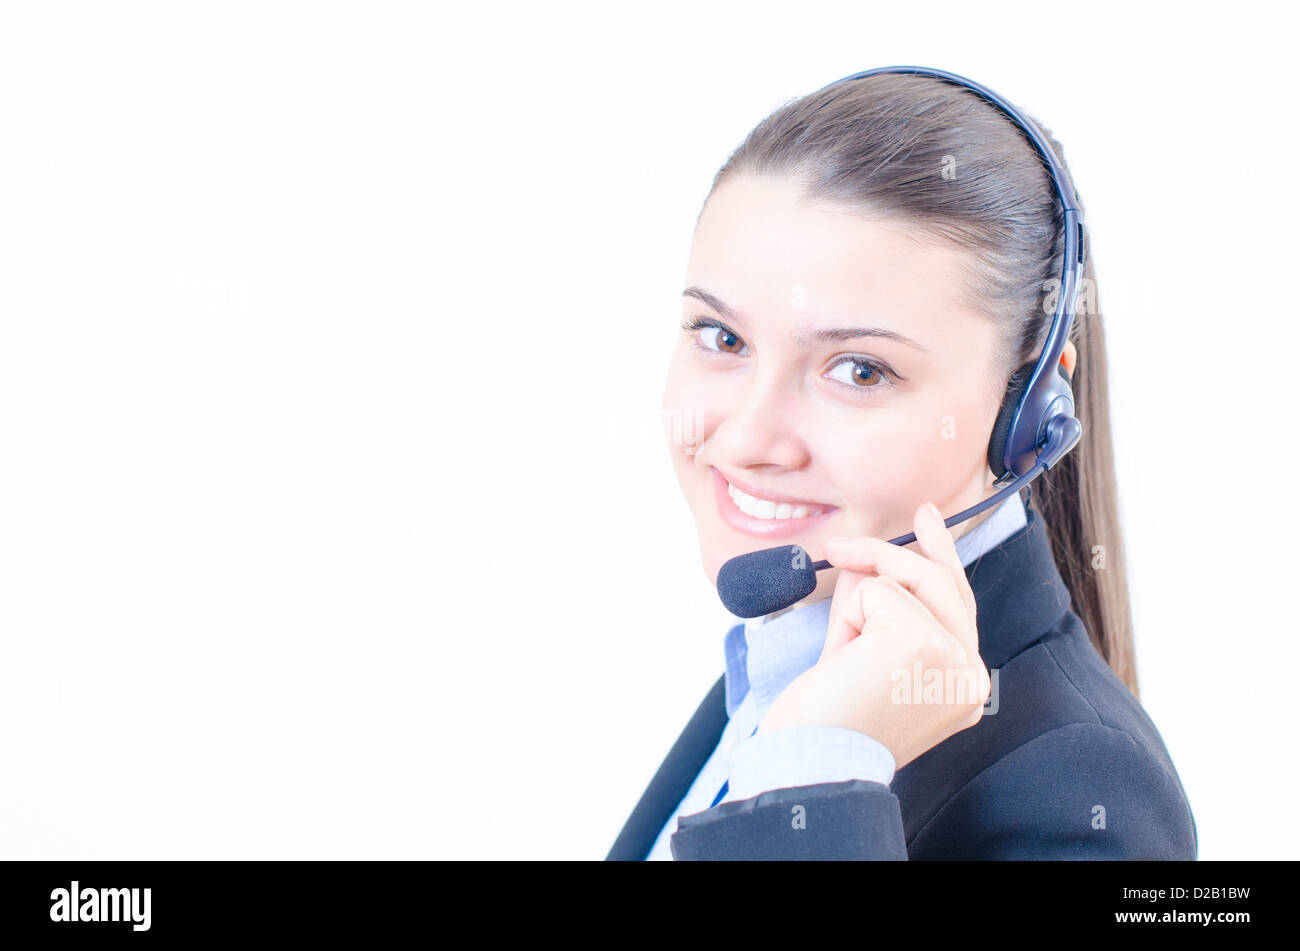 Female customer service representative at her desk - Stock Image